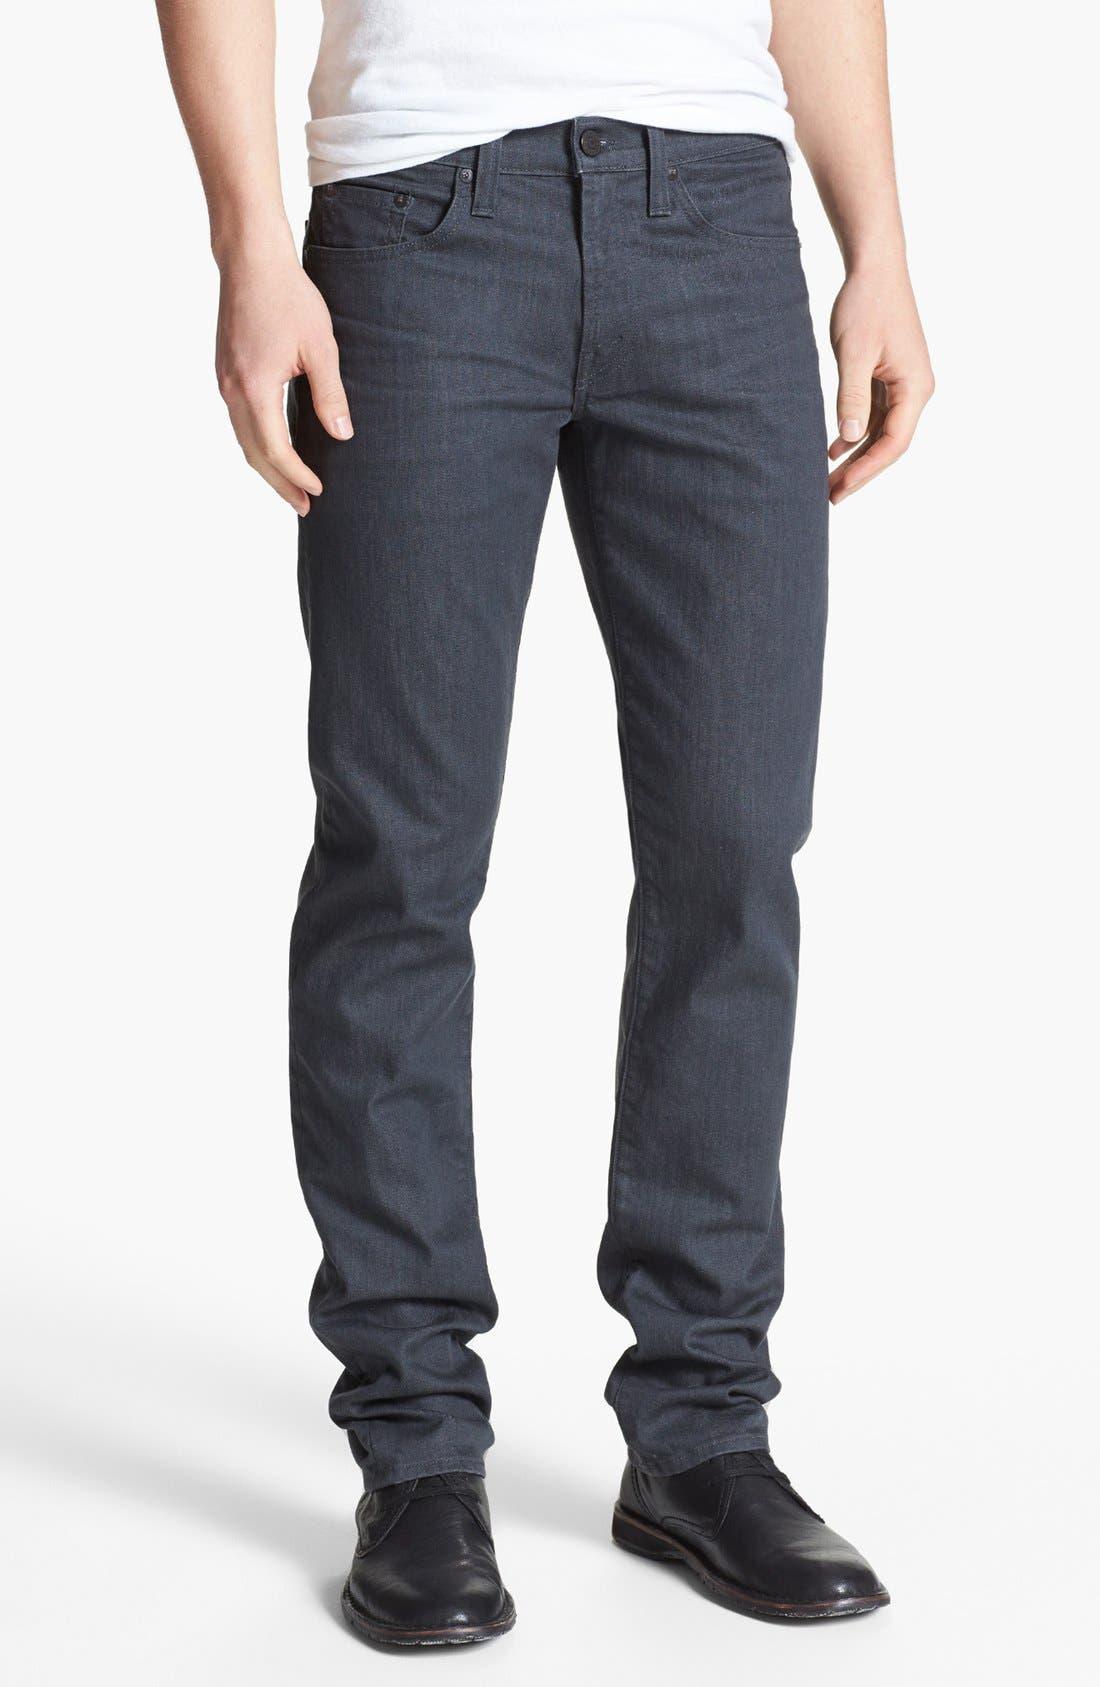 Alternate Image 1 Selected - J Brand Tyler Slim Fit Jeans (Slate Resin)